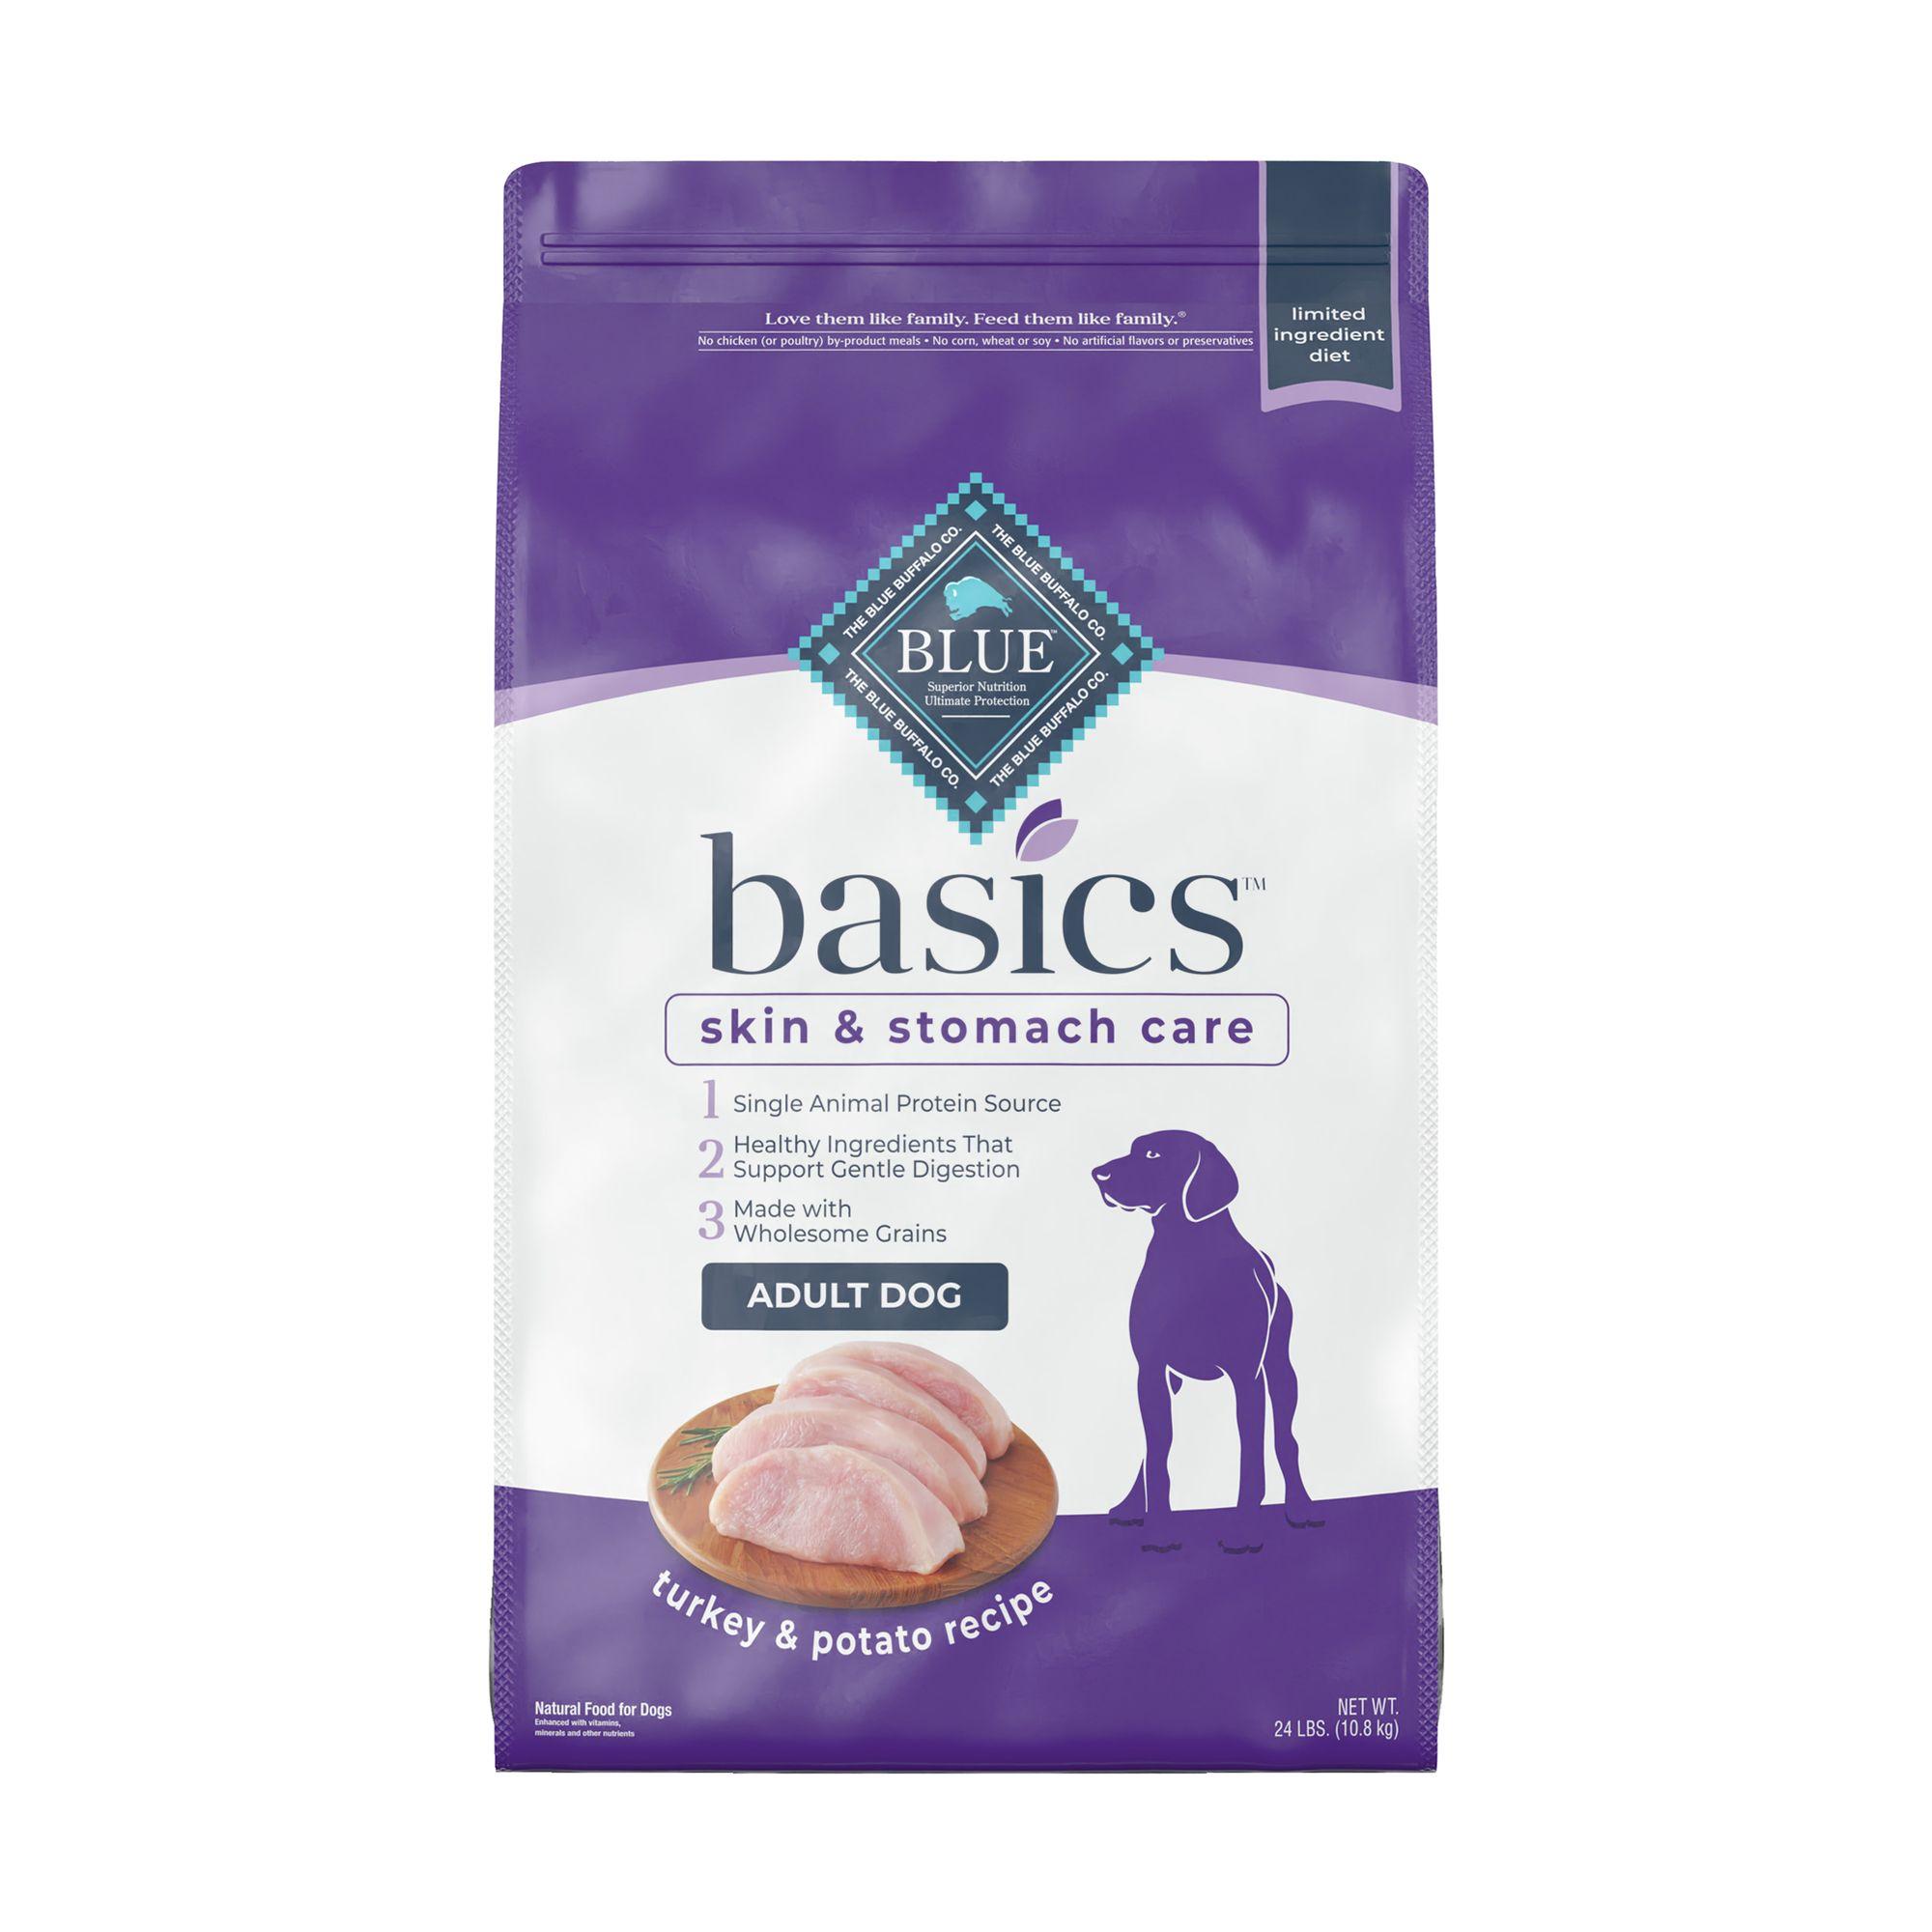 Blue Basics Limited Ingredient Adult Dog Food Size 24 Lb Blue Buffalo